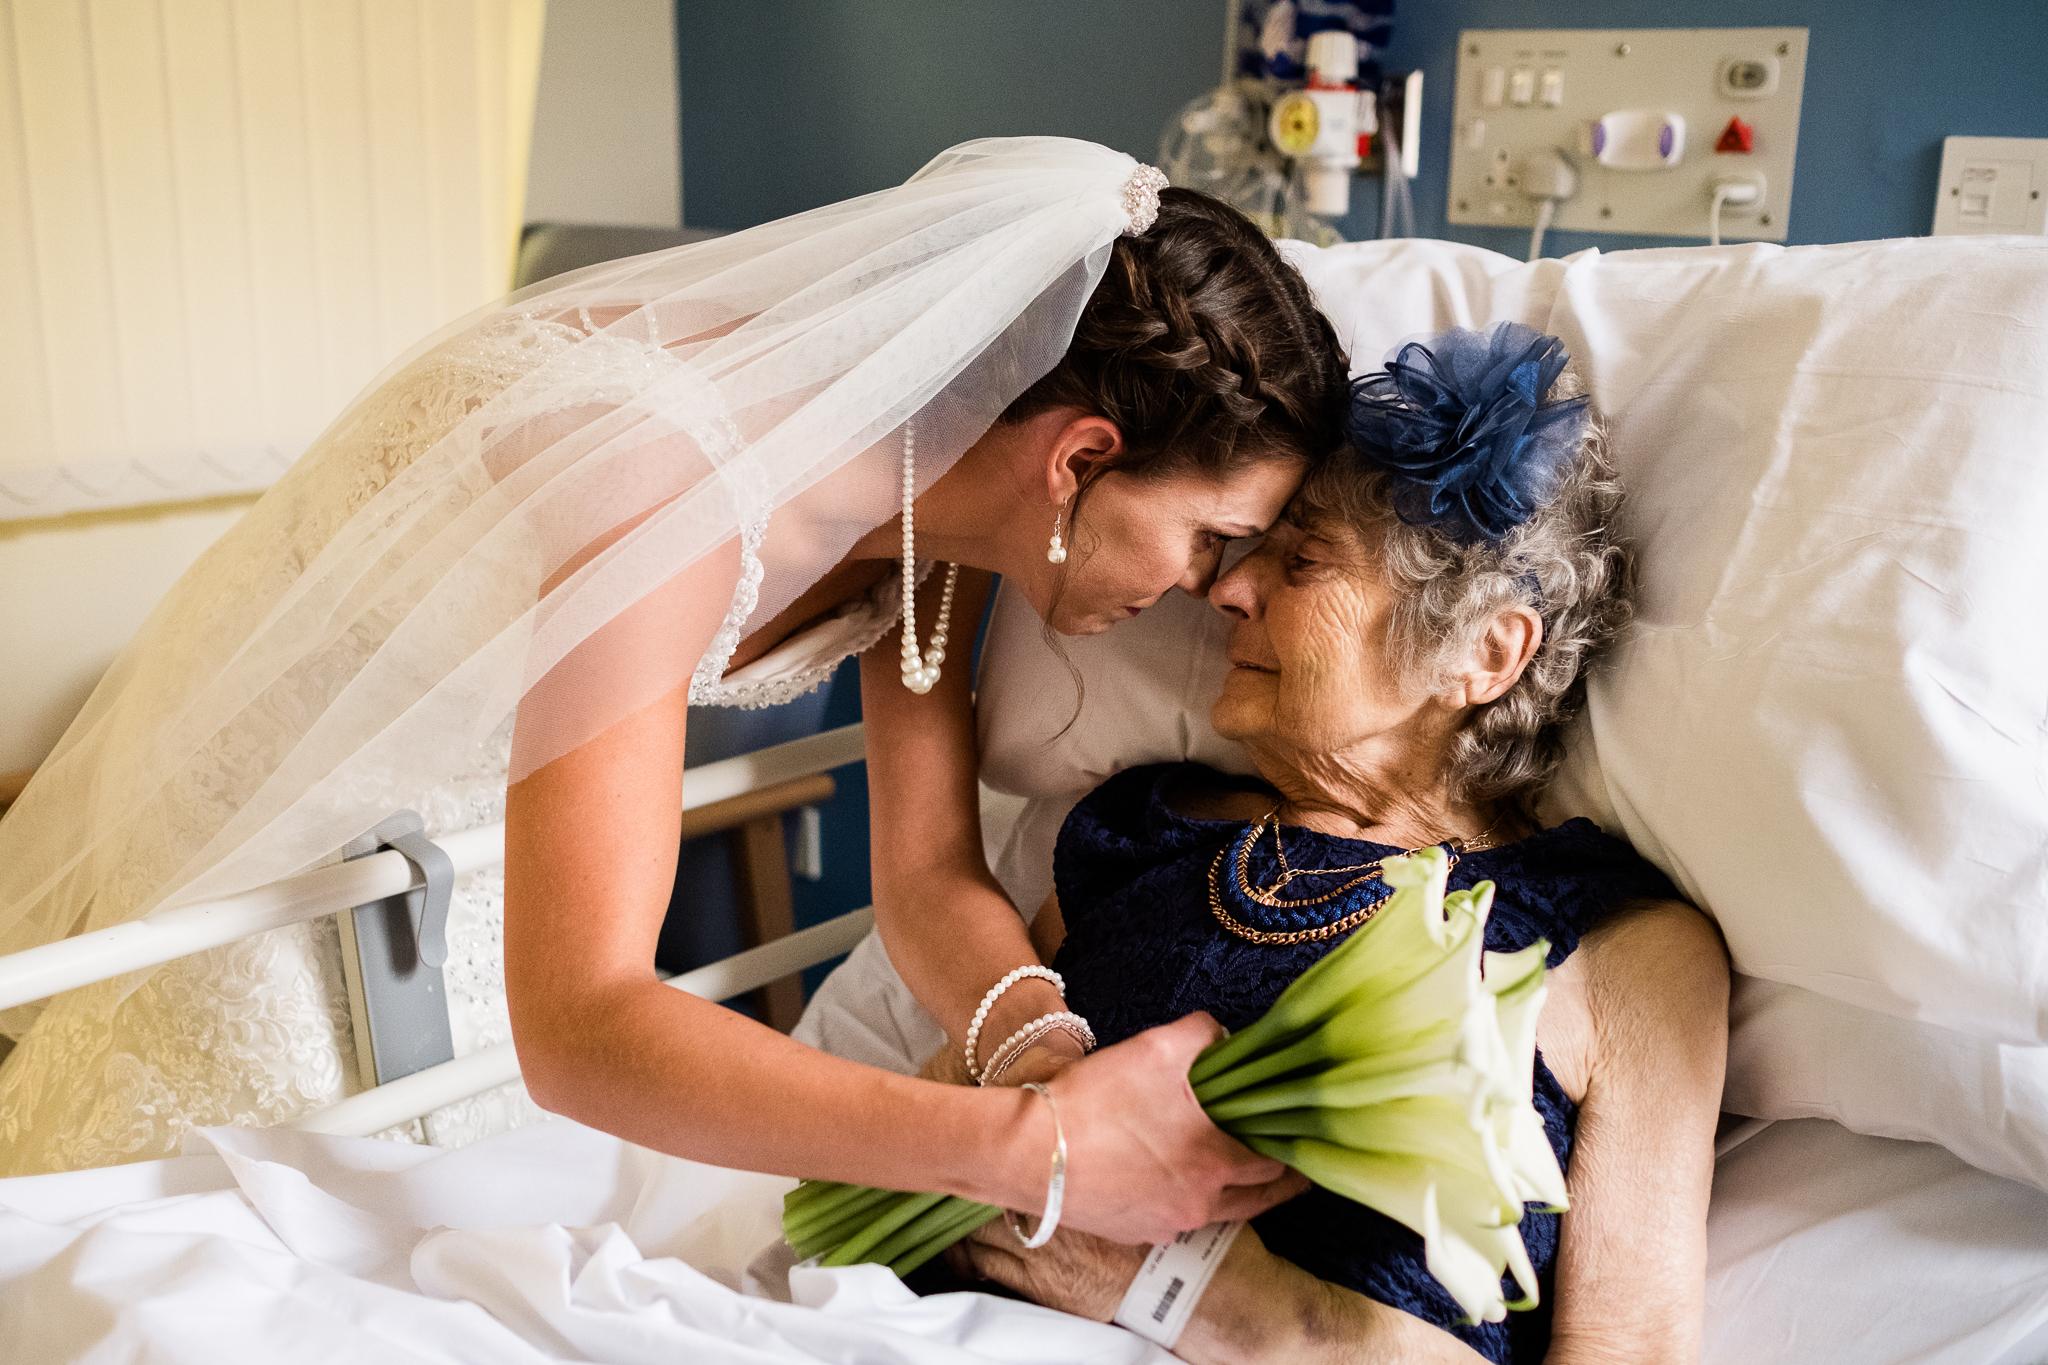 Staffordshire Wedding Catholic Newcastle-under-Lyme Floral Hall Tunstall Documentary Photography - Jenny Harper-30.jpg